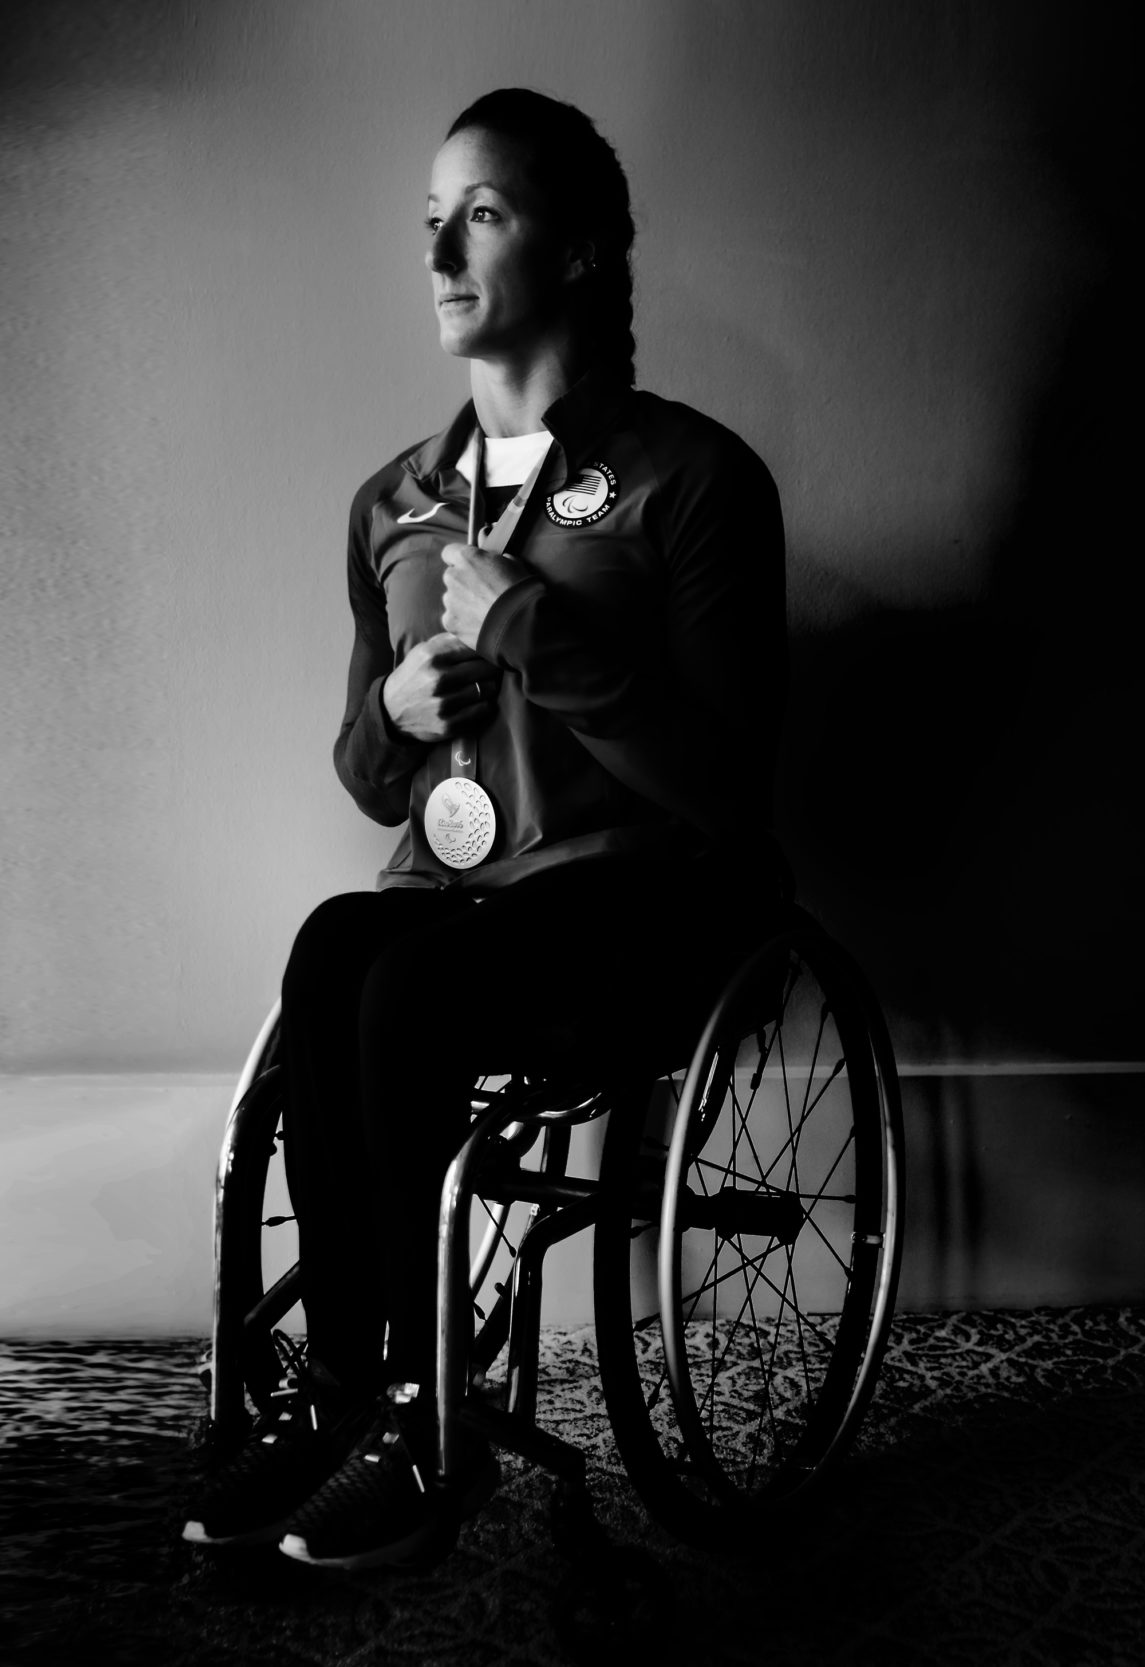 Tatyana McFadden. A 17x Paralympic medalist (7 gold), 14x world champion, 14x marathon winner